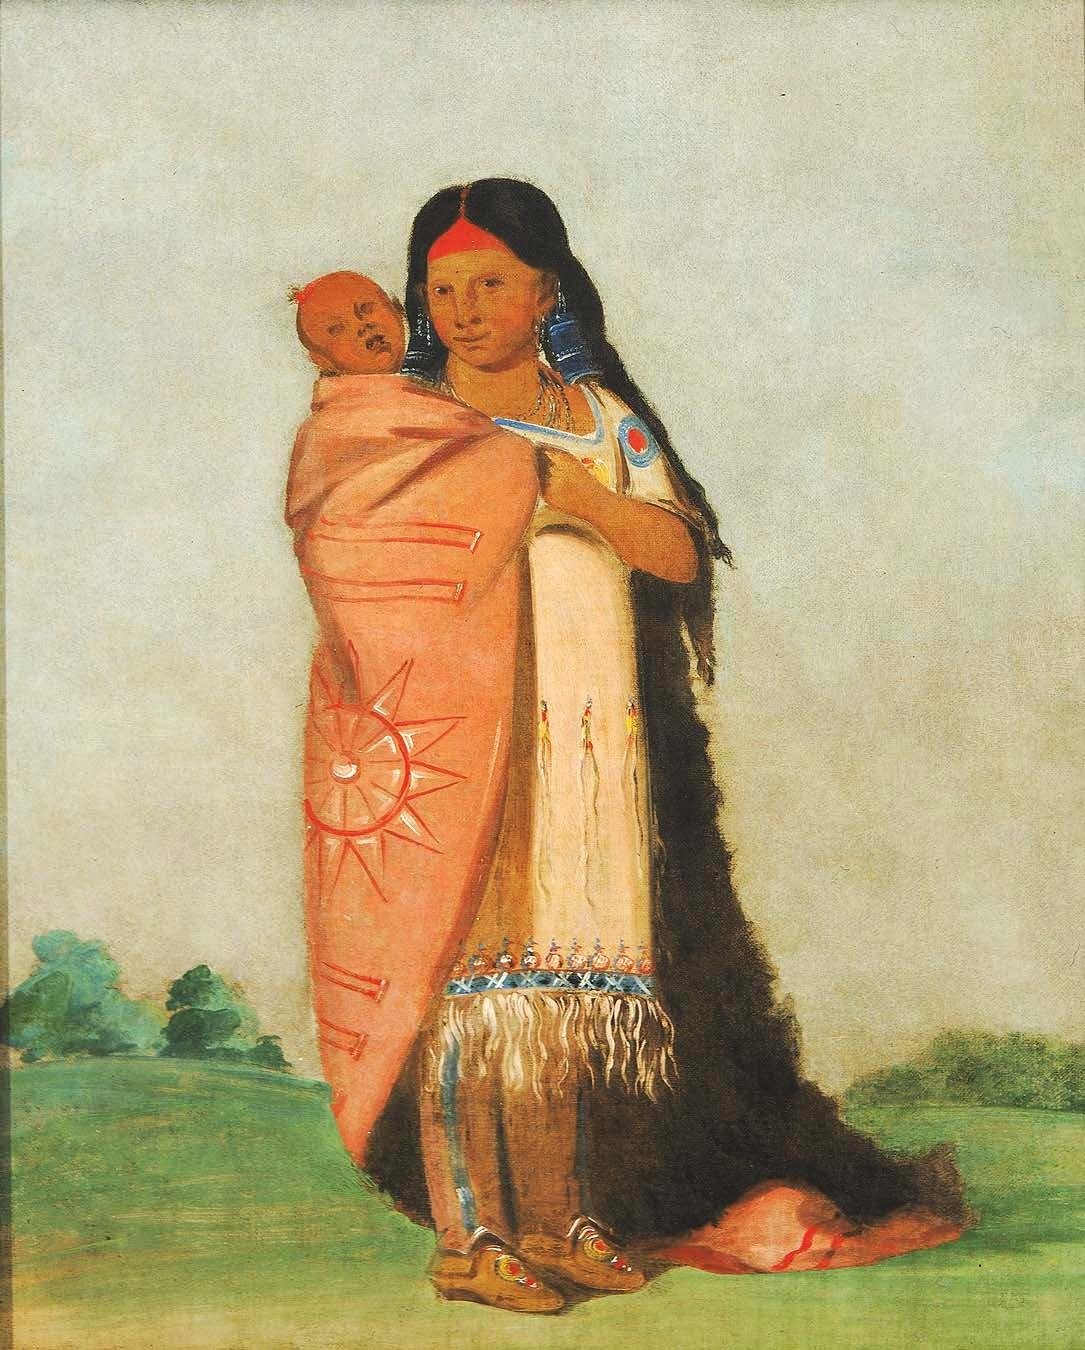 http://2.bp.blogspot.com/-I0atPKKuEJk/UKj7_ROKLqI/AAAAAAABOb8/x5wowMA06fU/s1600/George+Catlin+(American+artist,+1796-1872)+Tsee-mo%C3%BAnt,+Great+Wonder,+Carrying+Her+Baby+in+Her+Robe.jpg